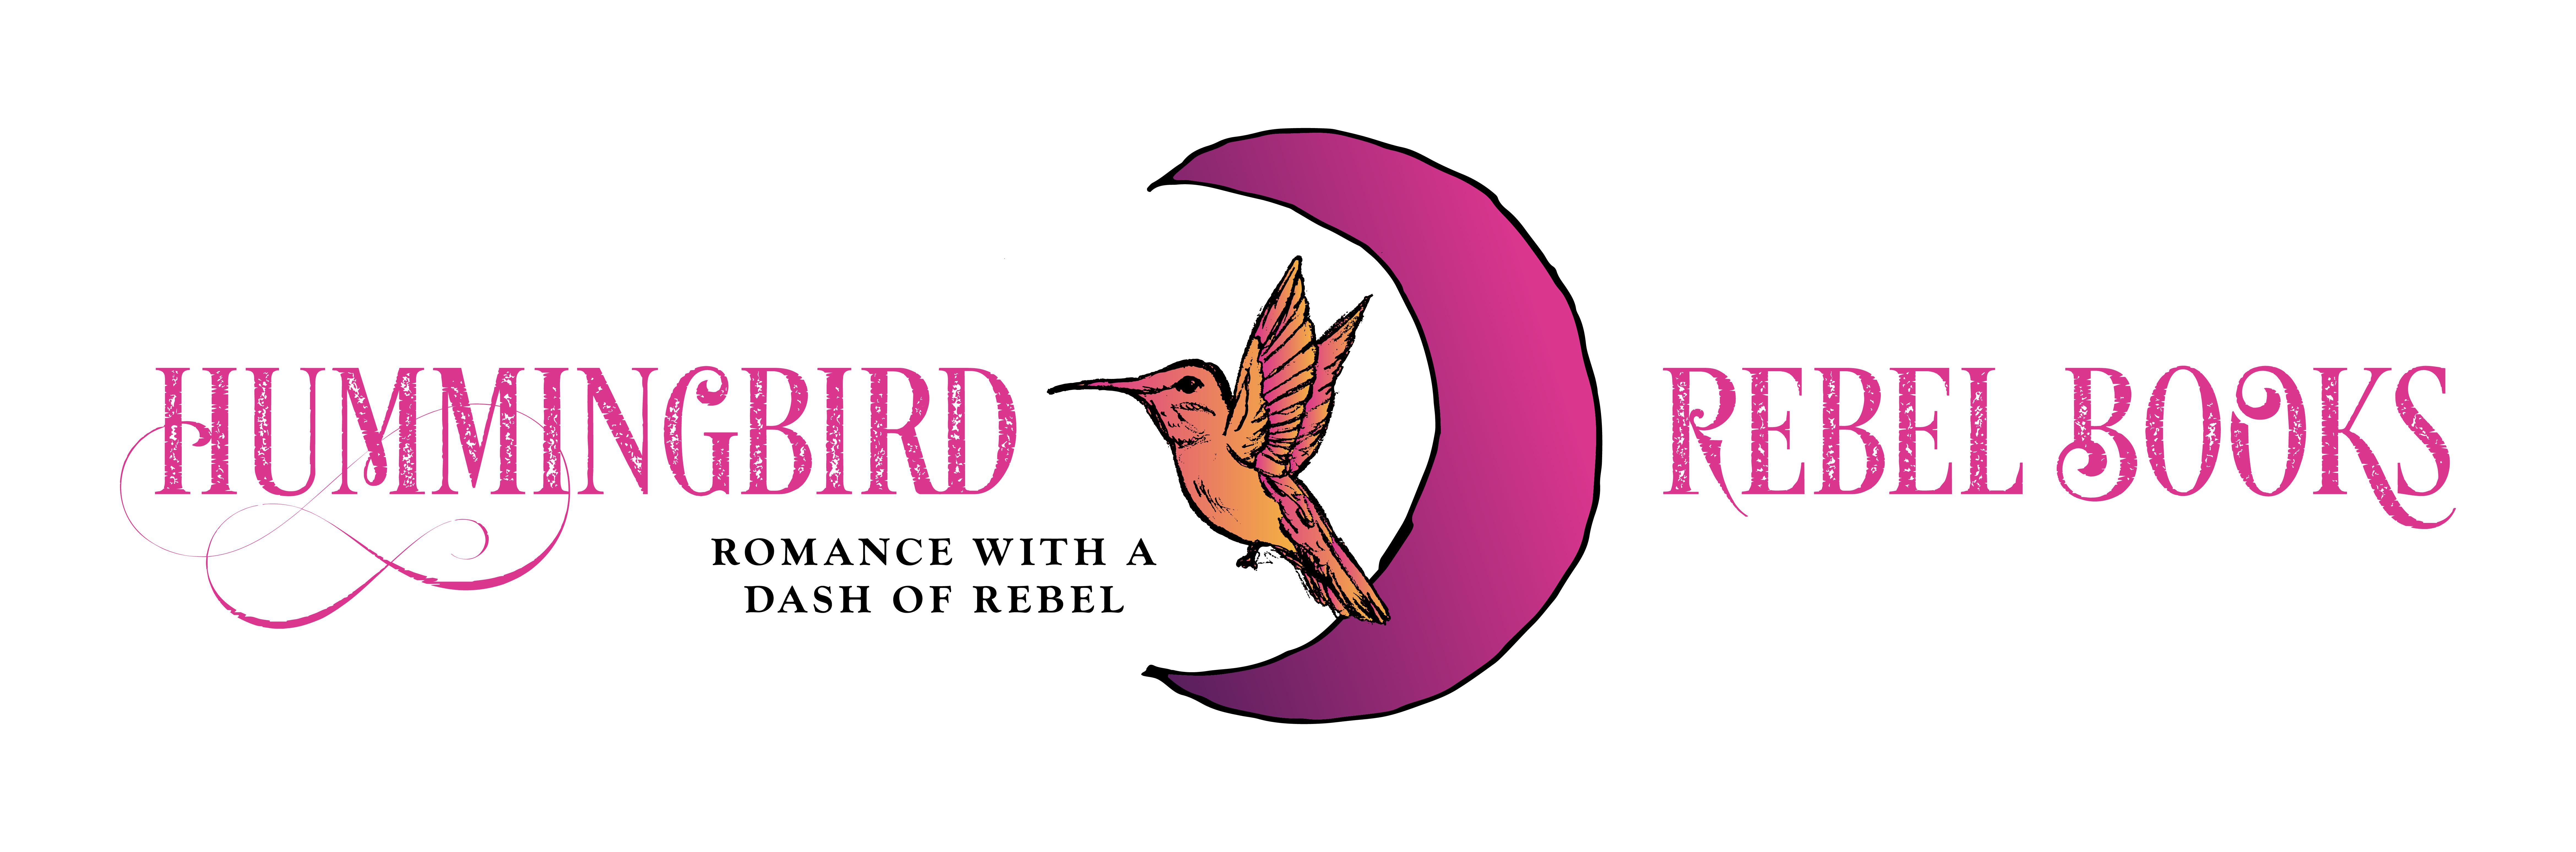 HummingbirdRebelBooks_FinalBranding_Main